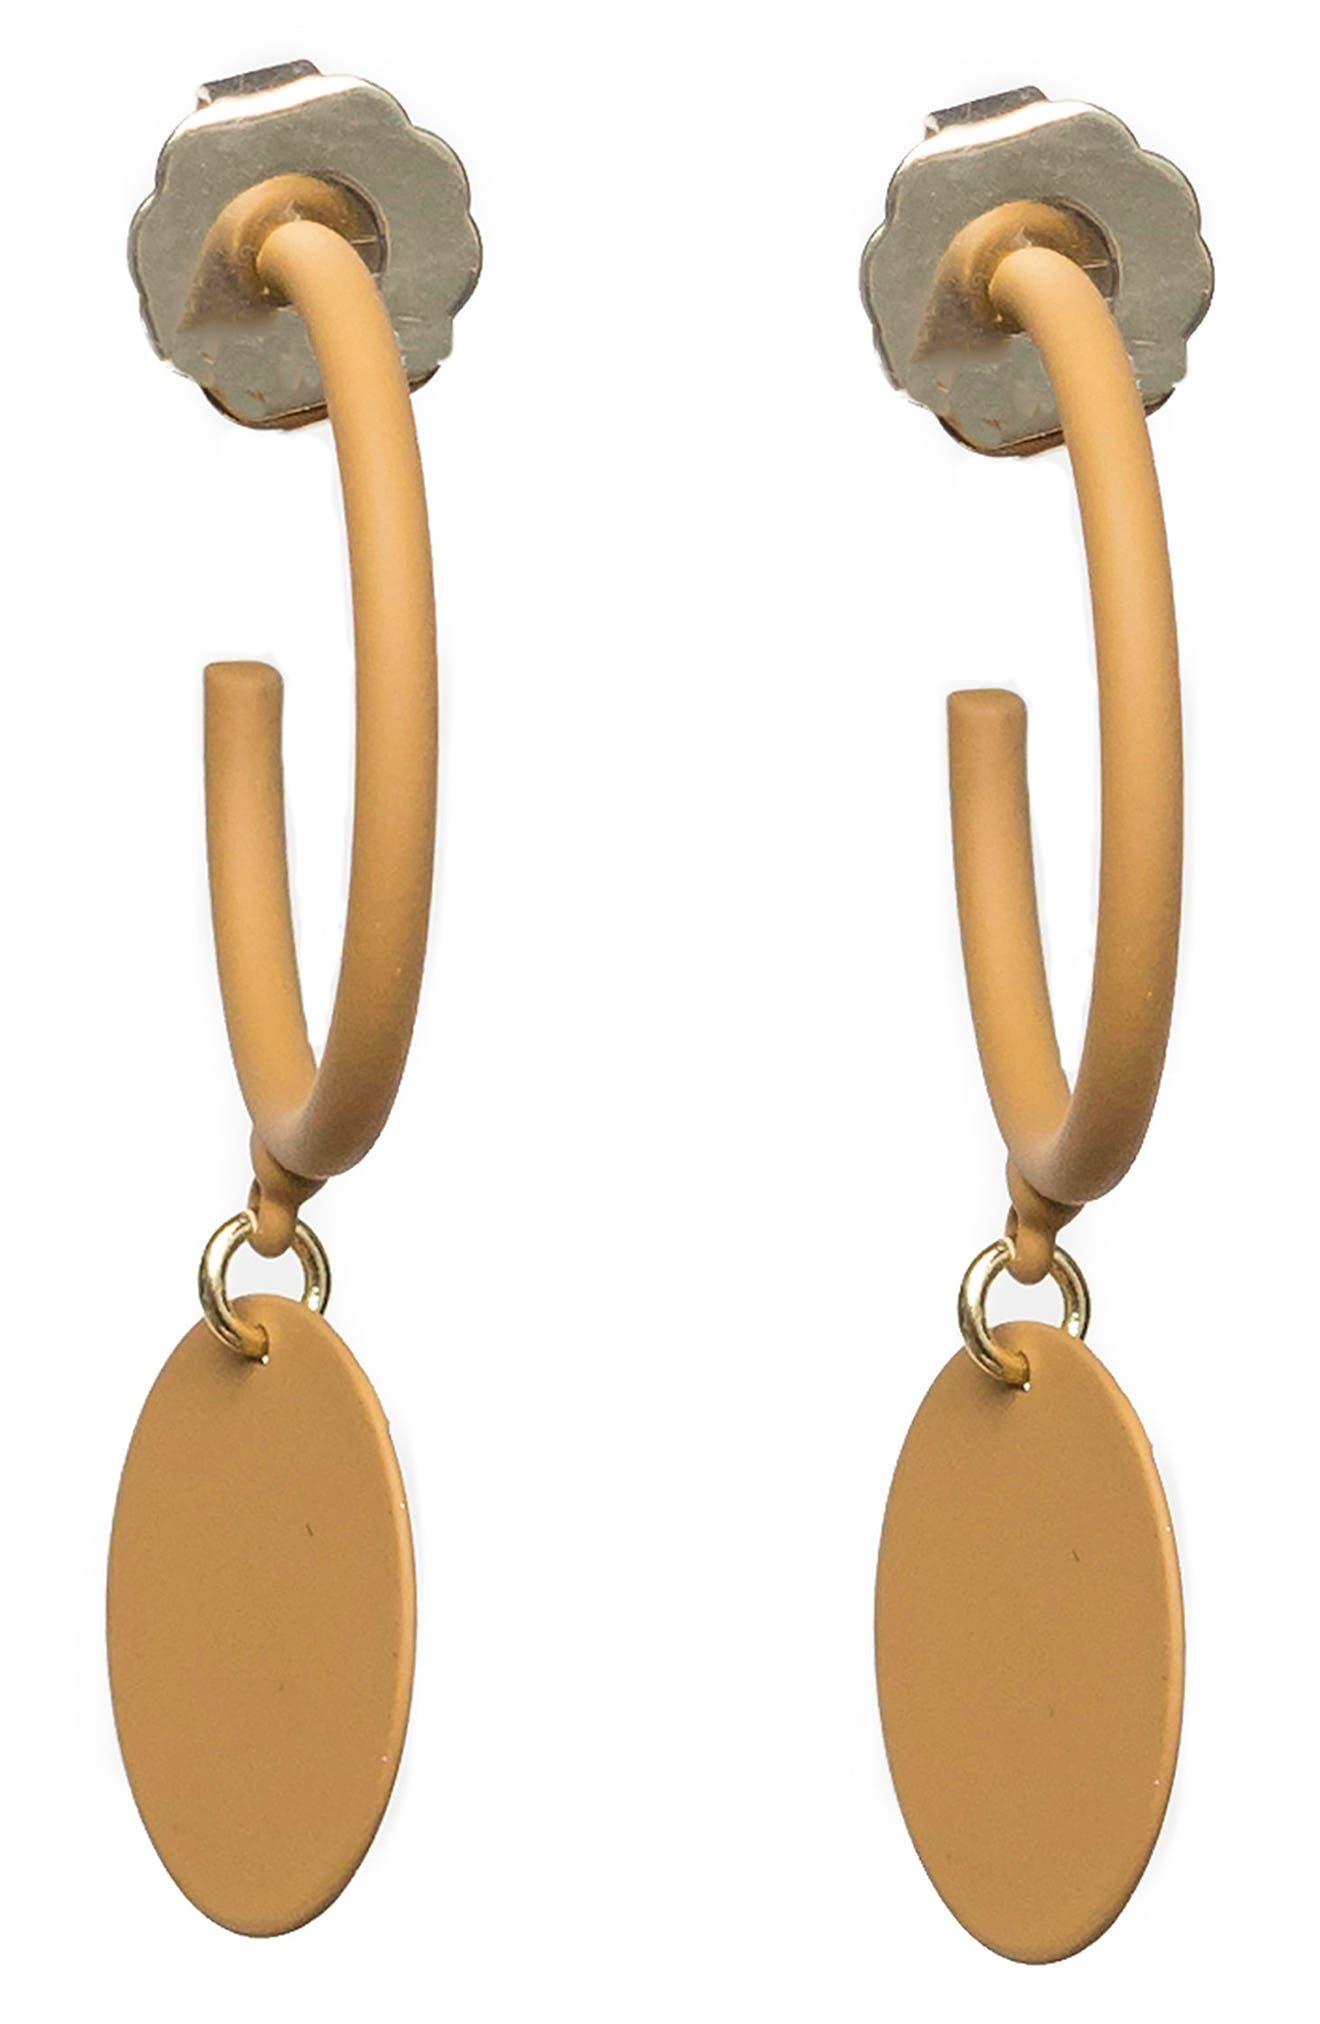 Hanging Medallion Hoop Earrings,                         Main,                         color, Yellow